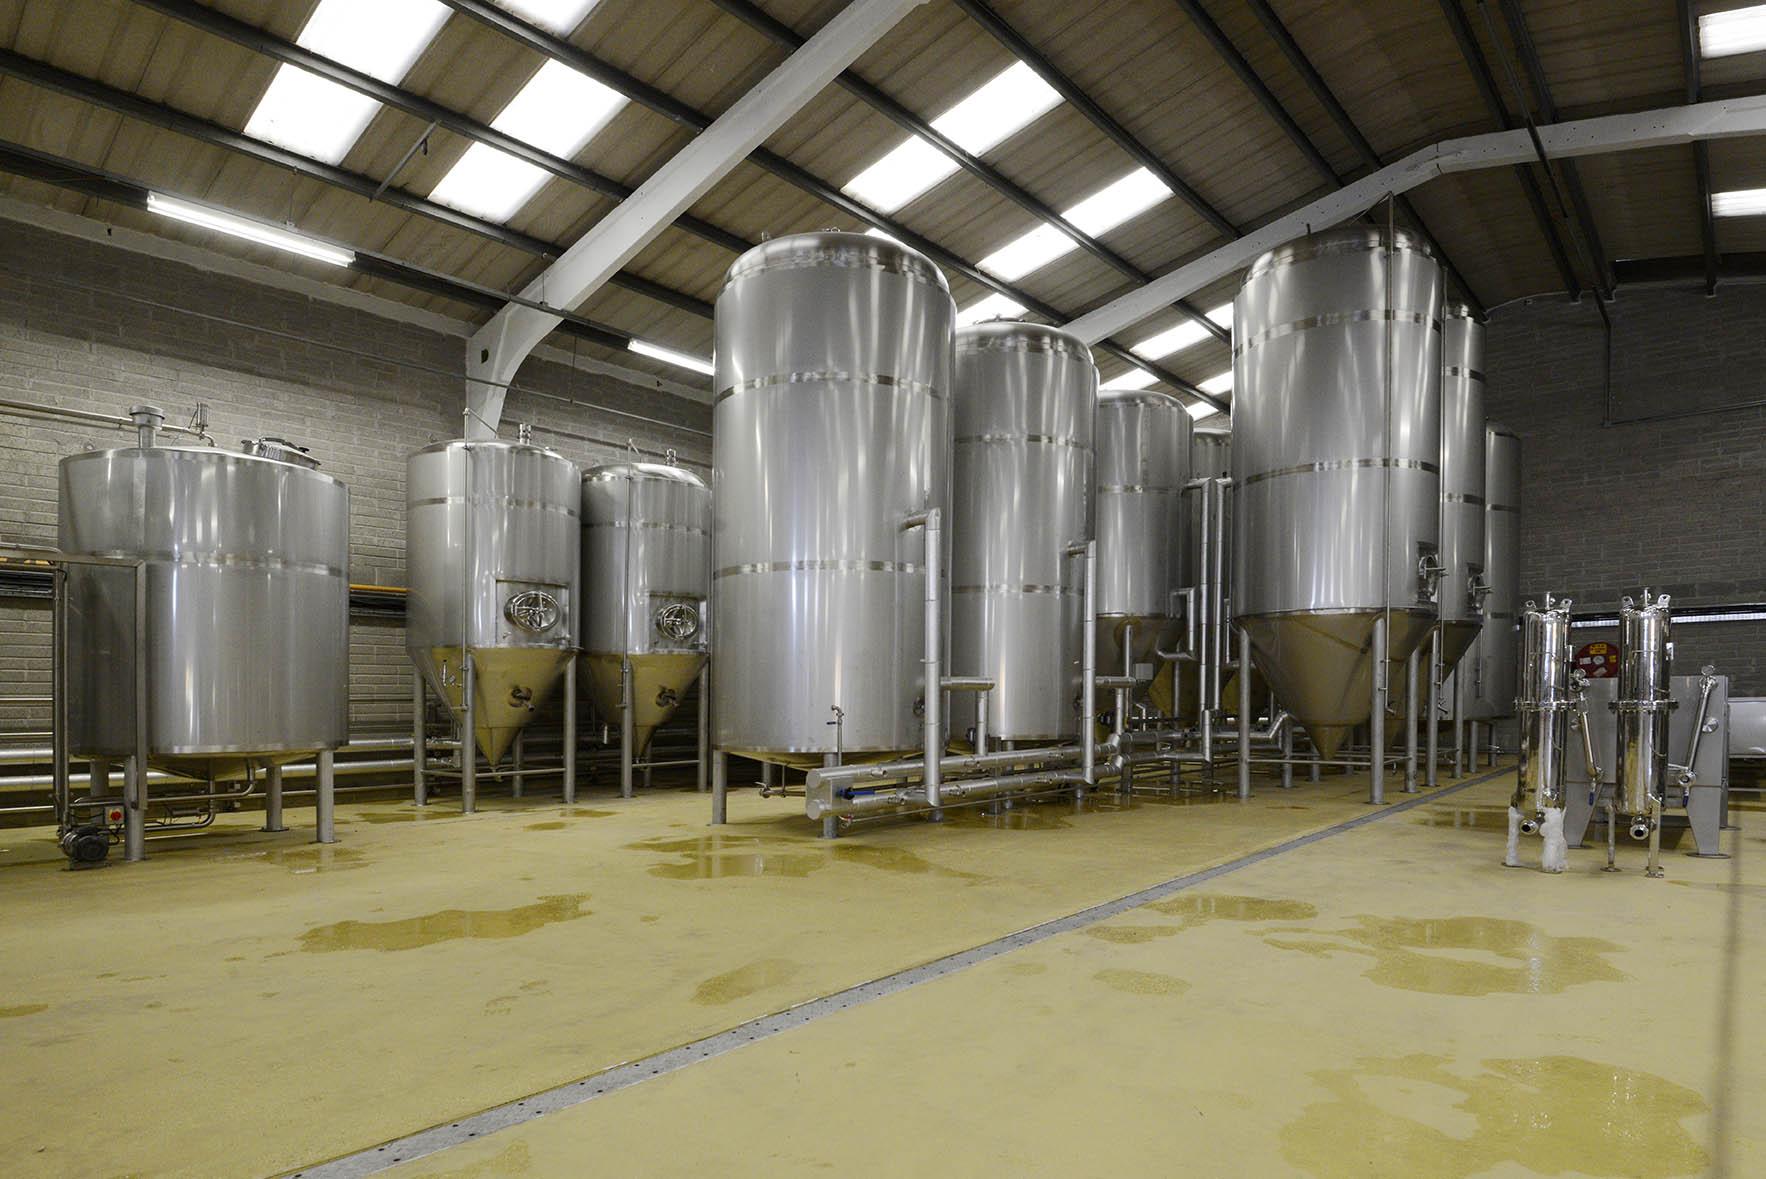 Dundalk Bay Brewing Co Spectac International